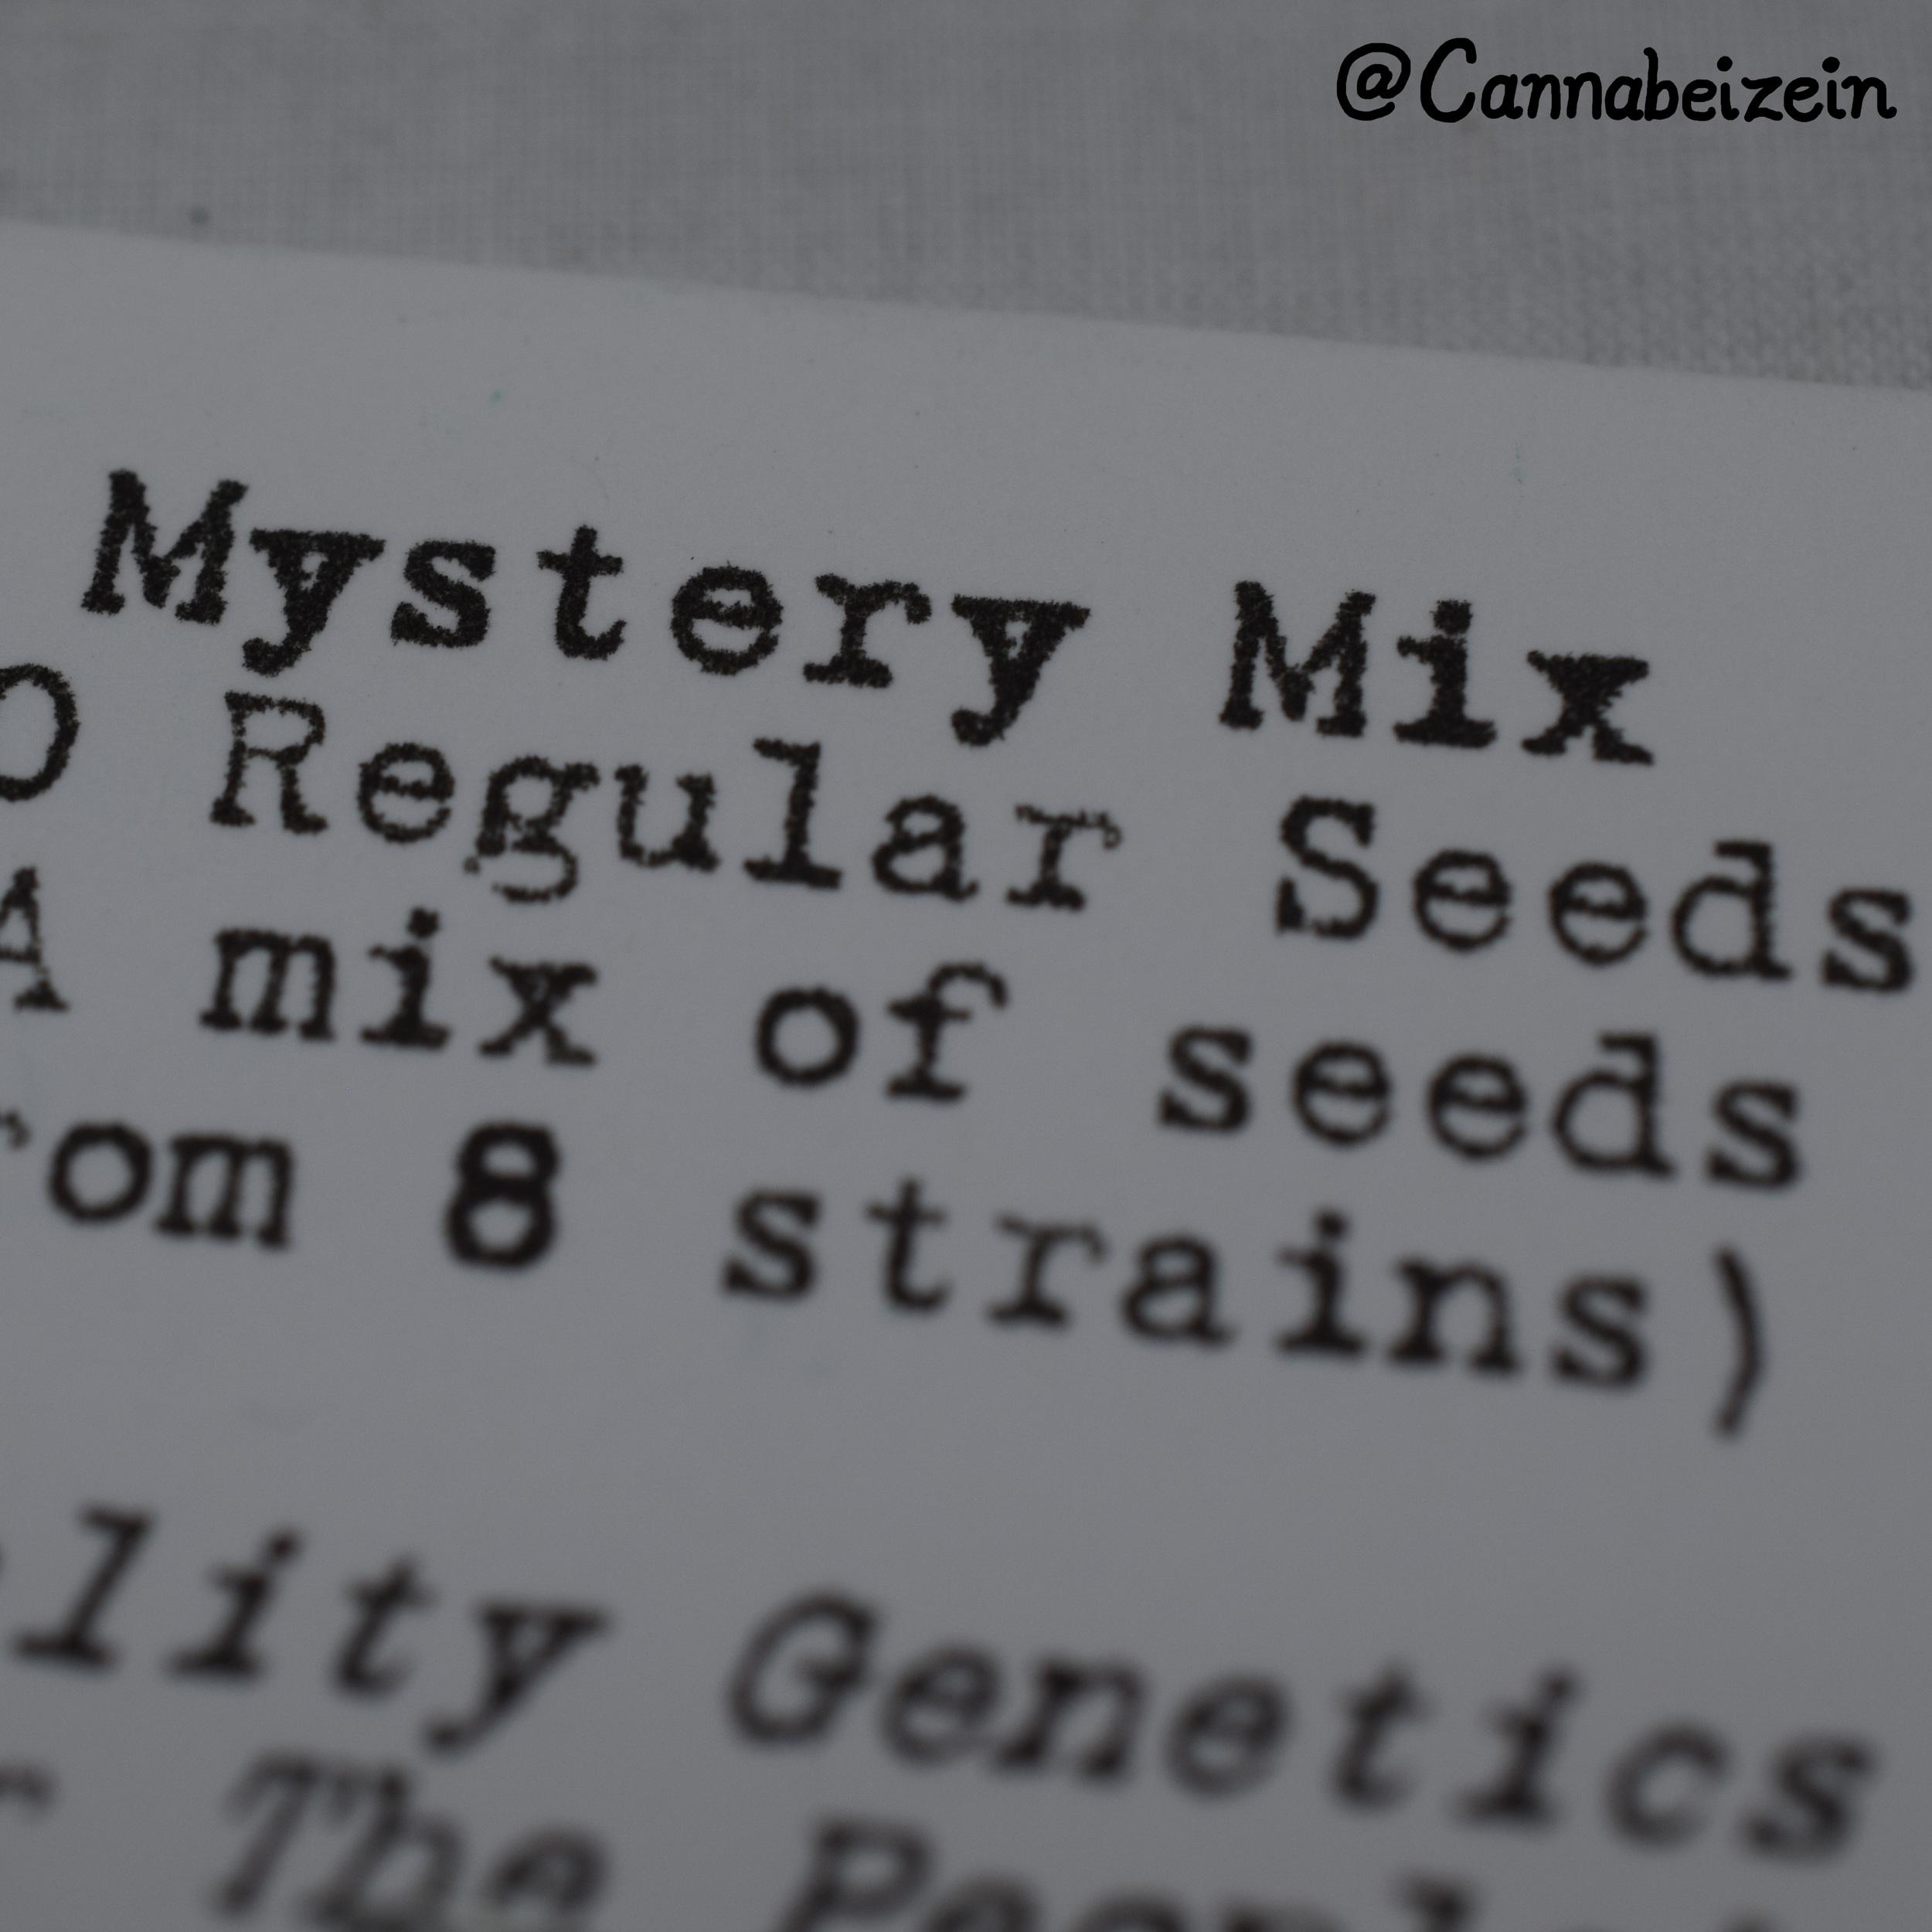 Cannabeizein 0087 - Mystery Mix - DSC_1073 copy.jpg